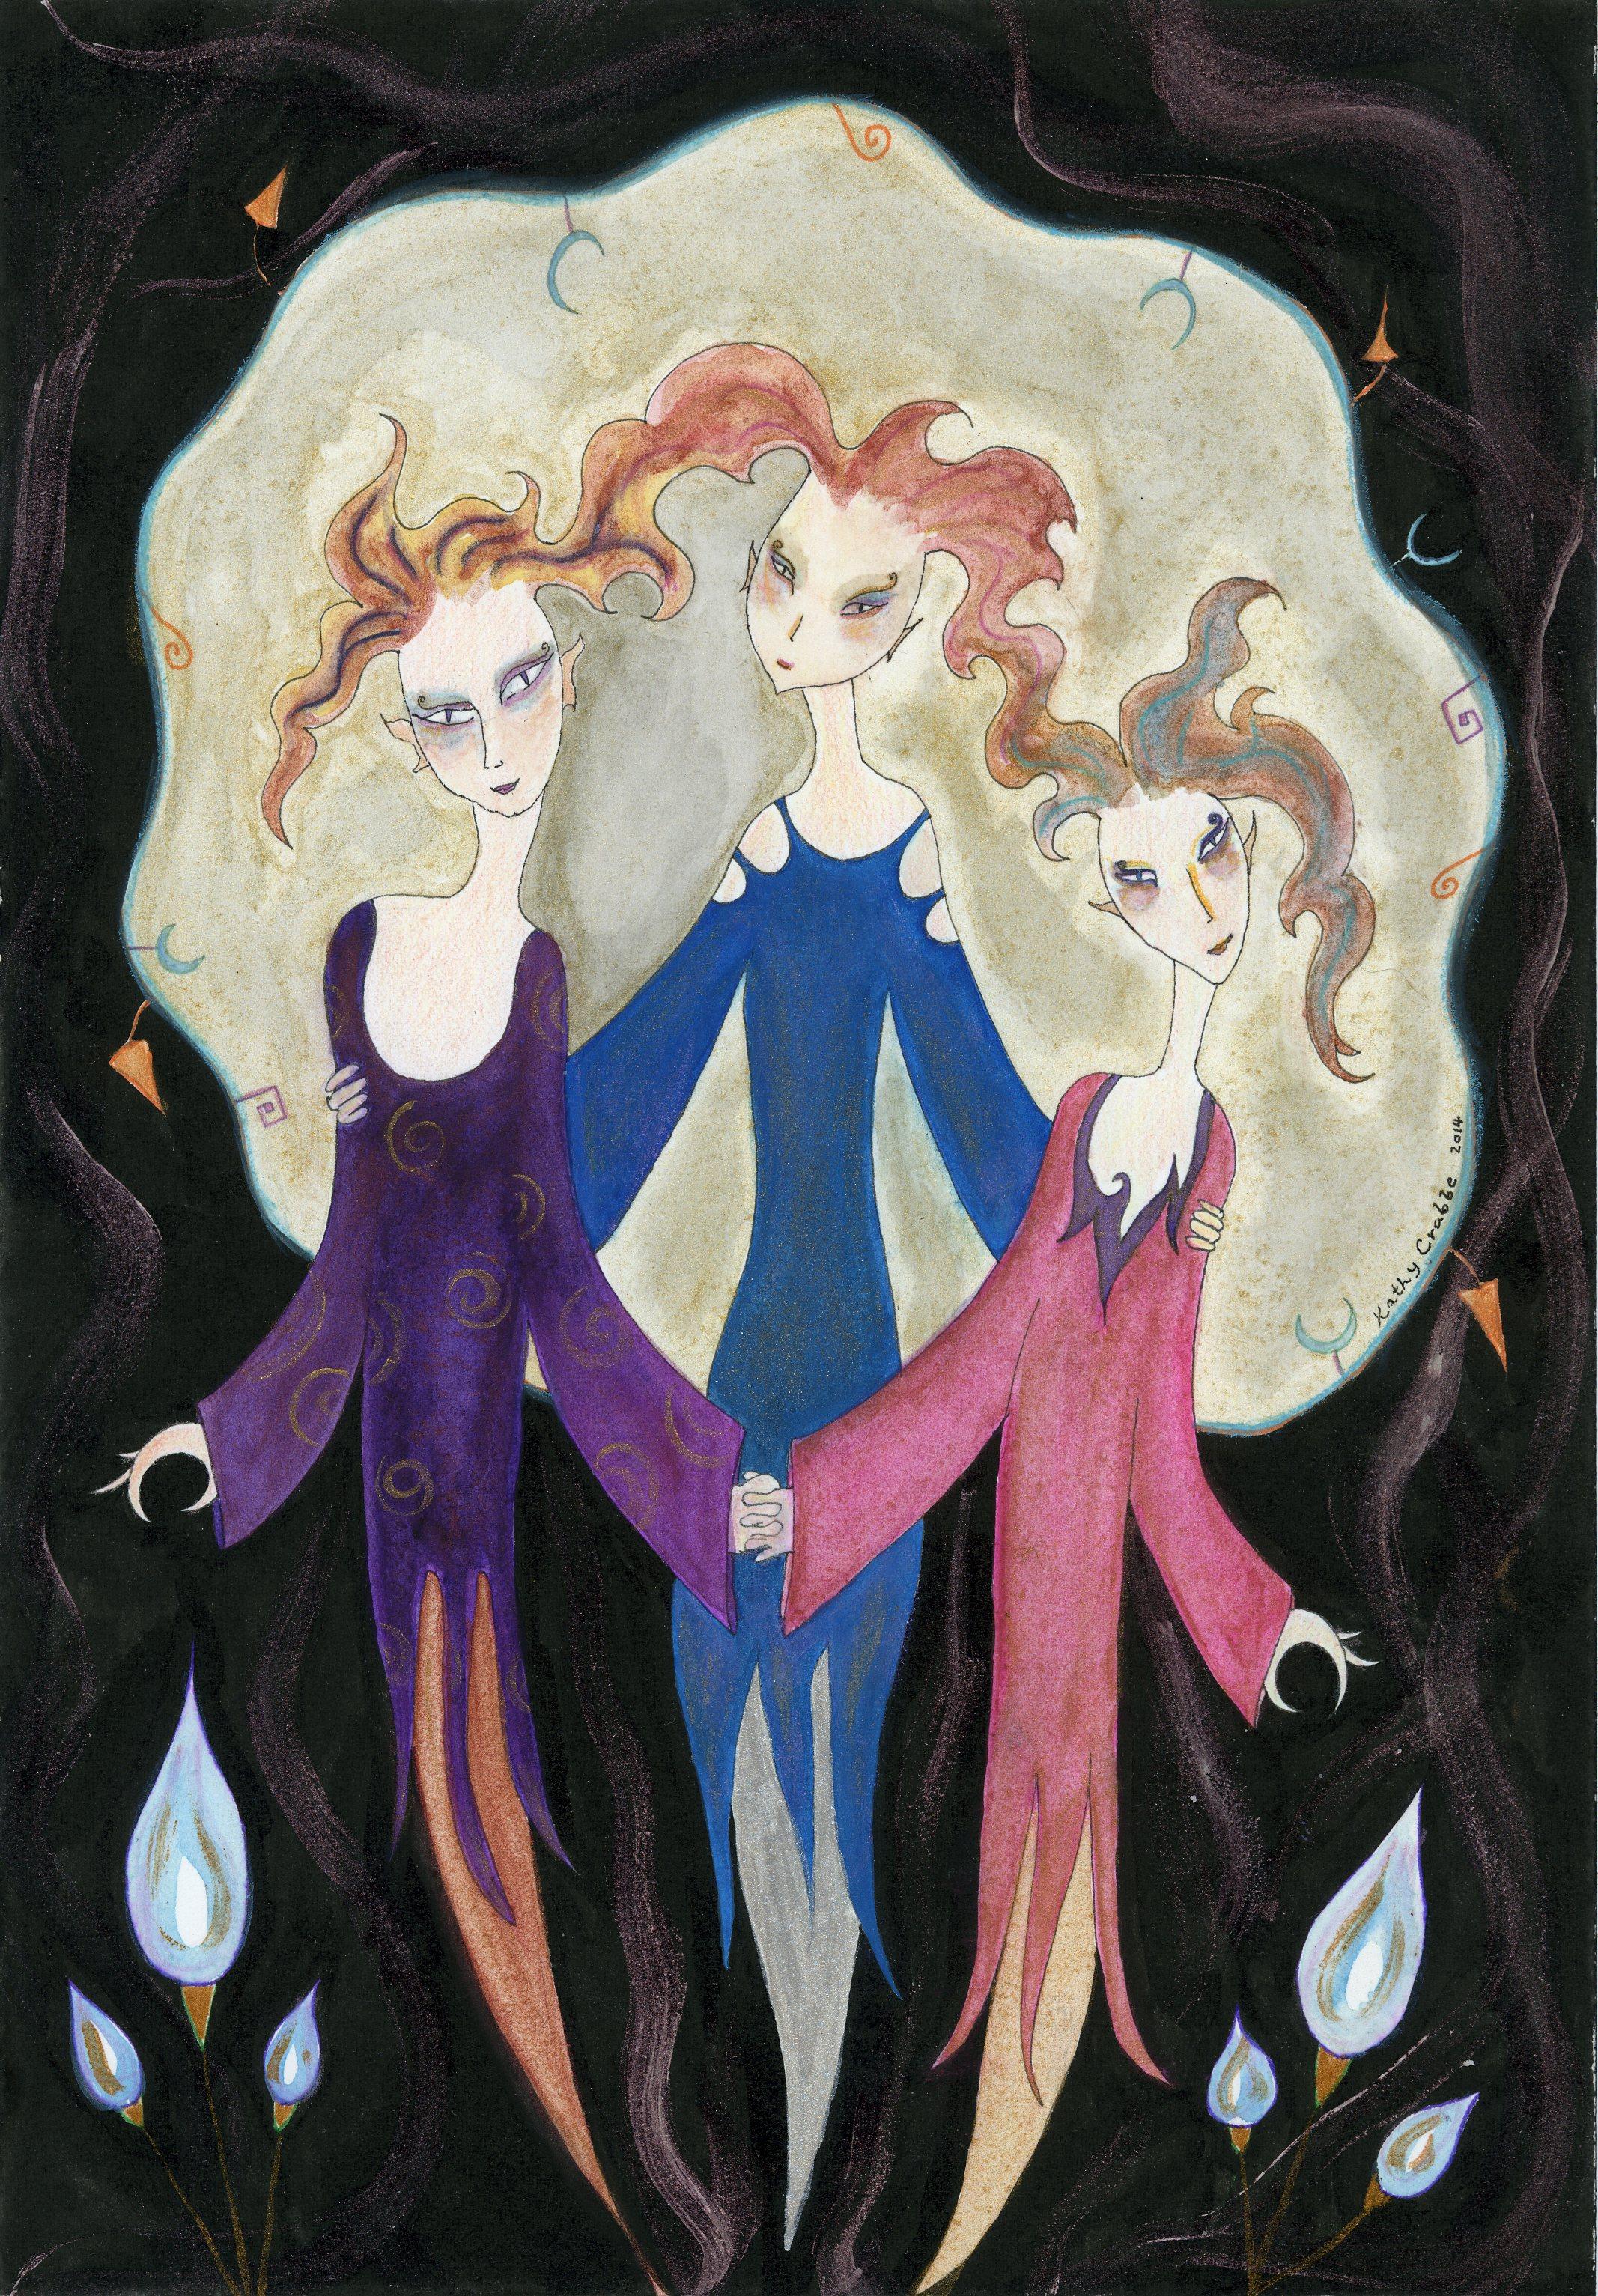 Trois Soeurs by Kathy Crabbe